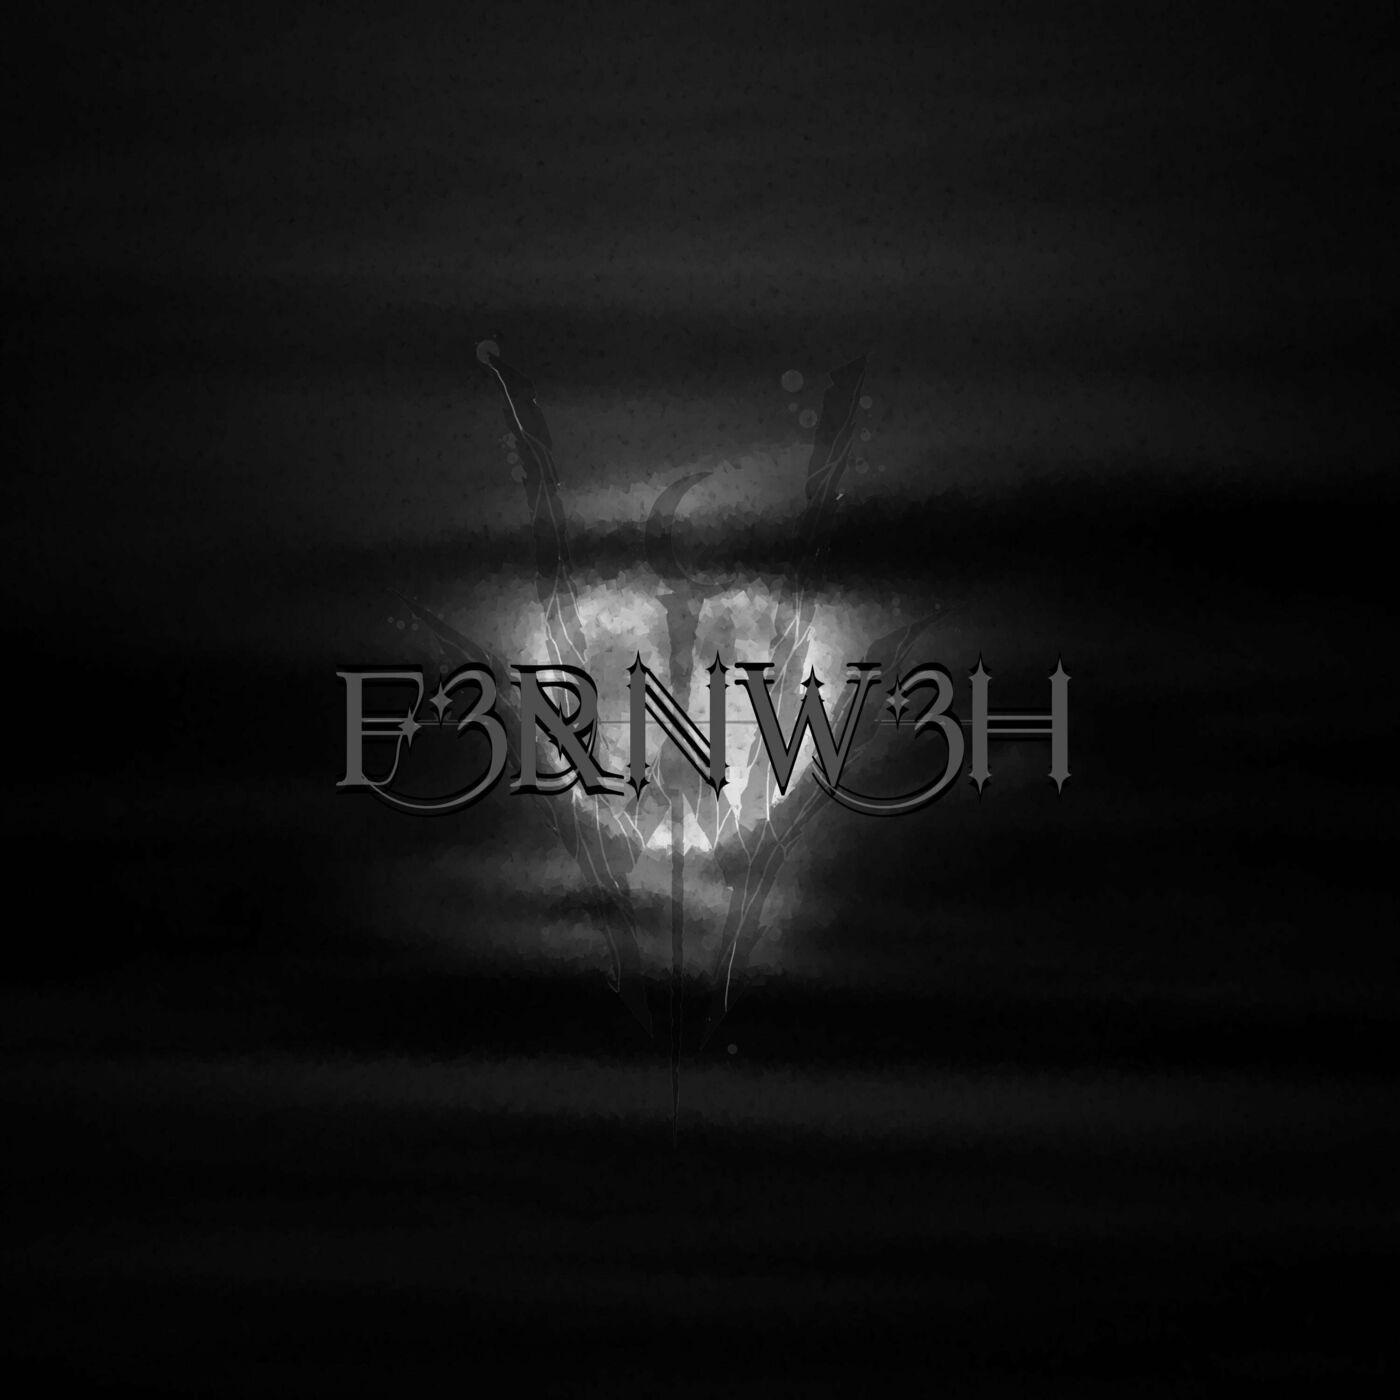 Hjärna Waves - F3rnw3h [single] (2021)